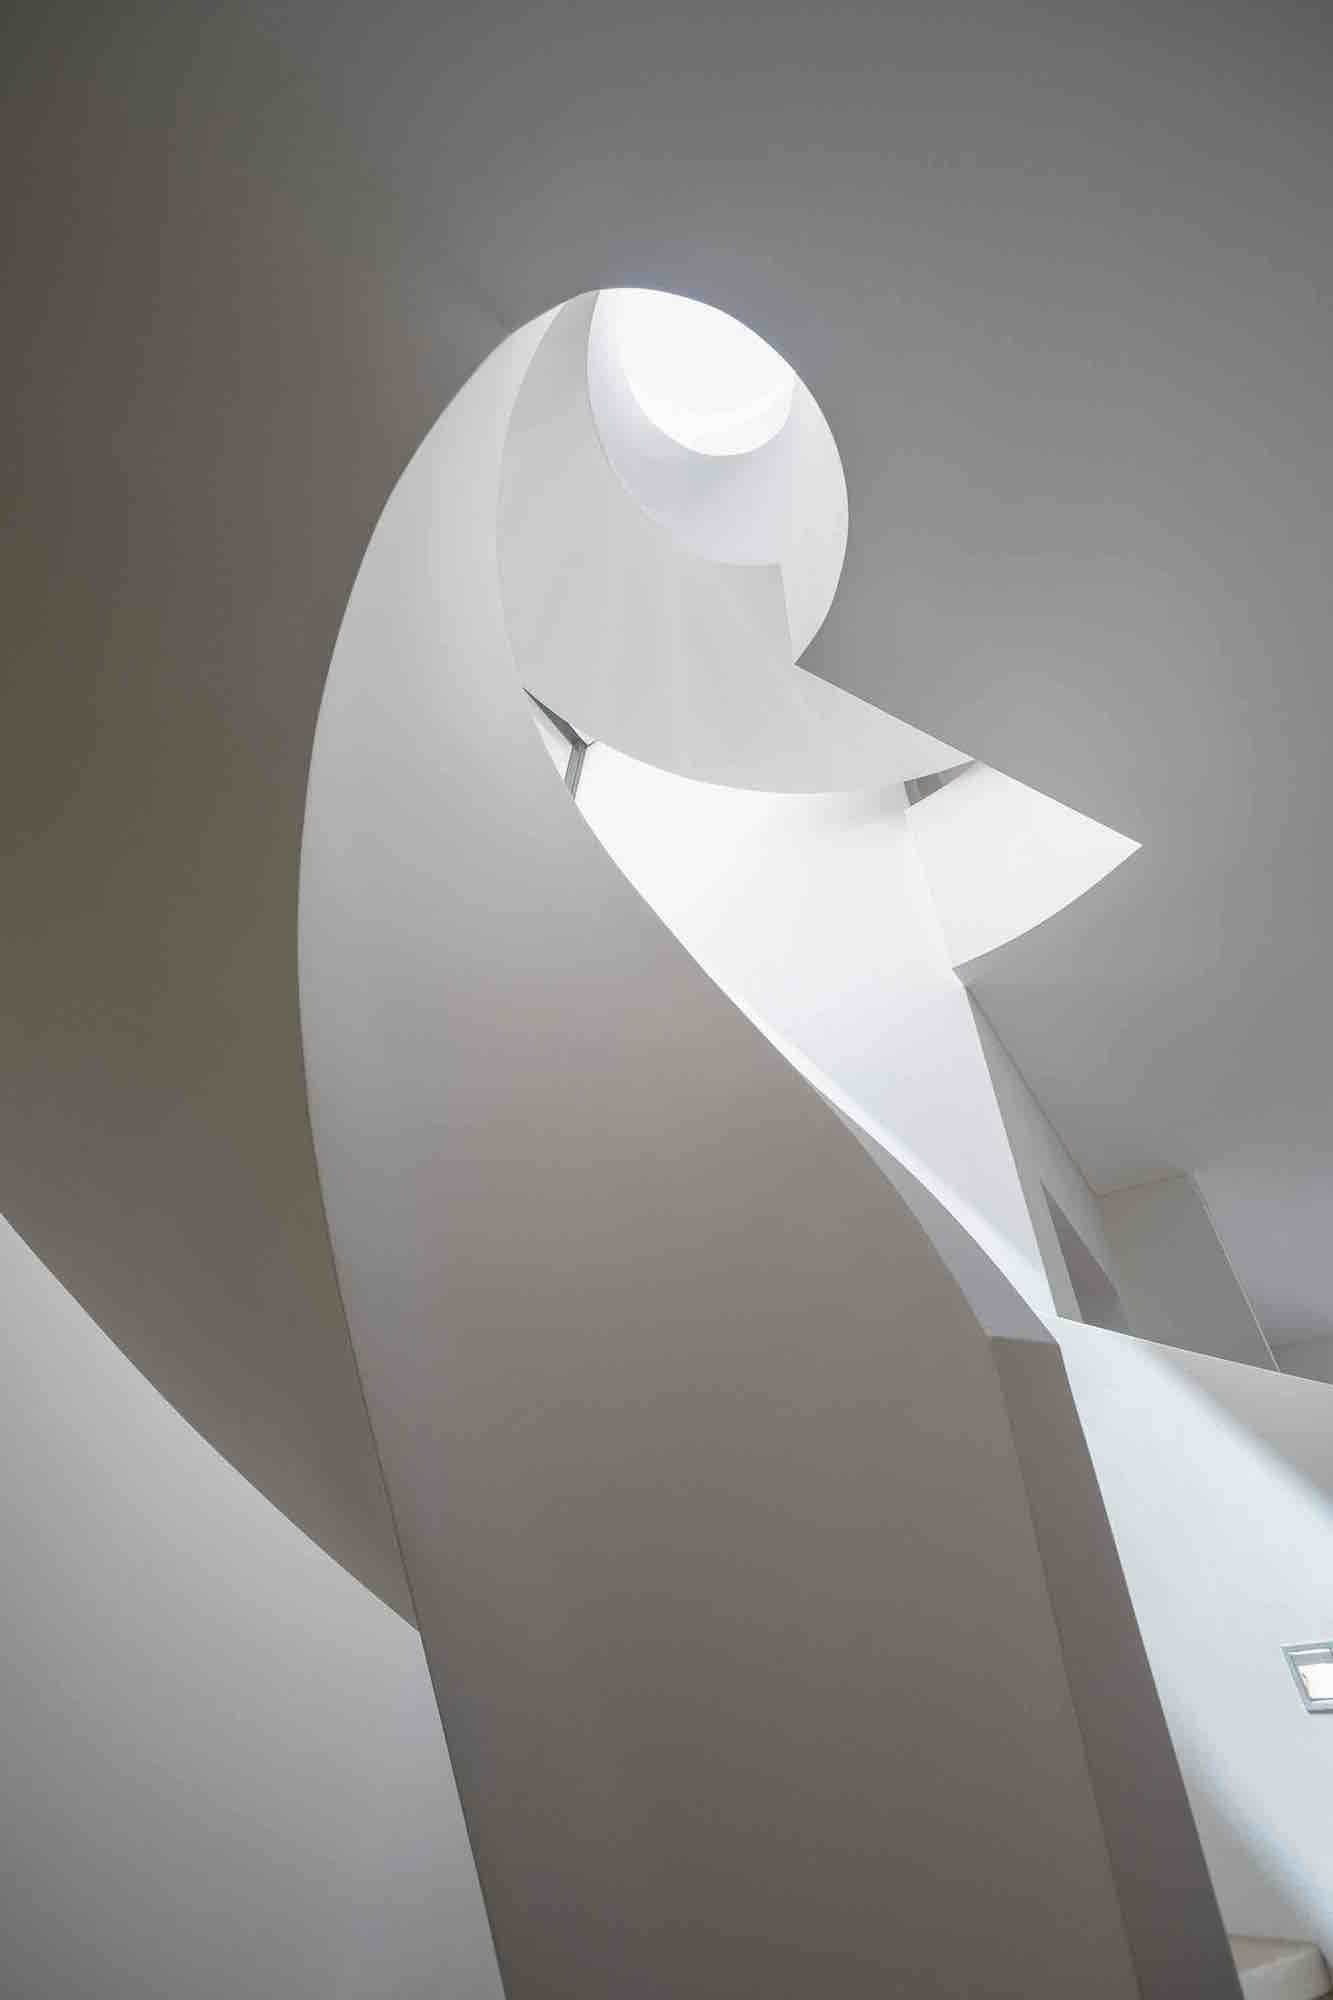 hewlett-street-house-mpr-design-group_hewlett_house05